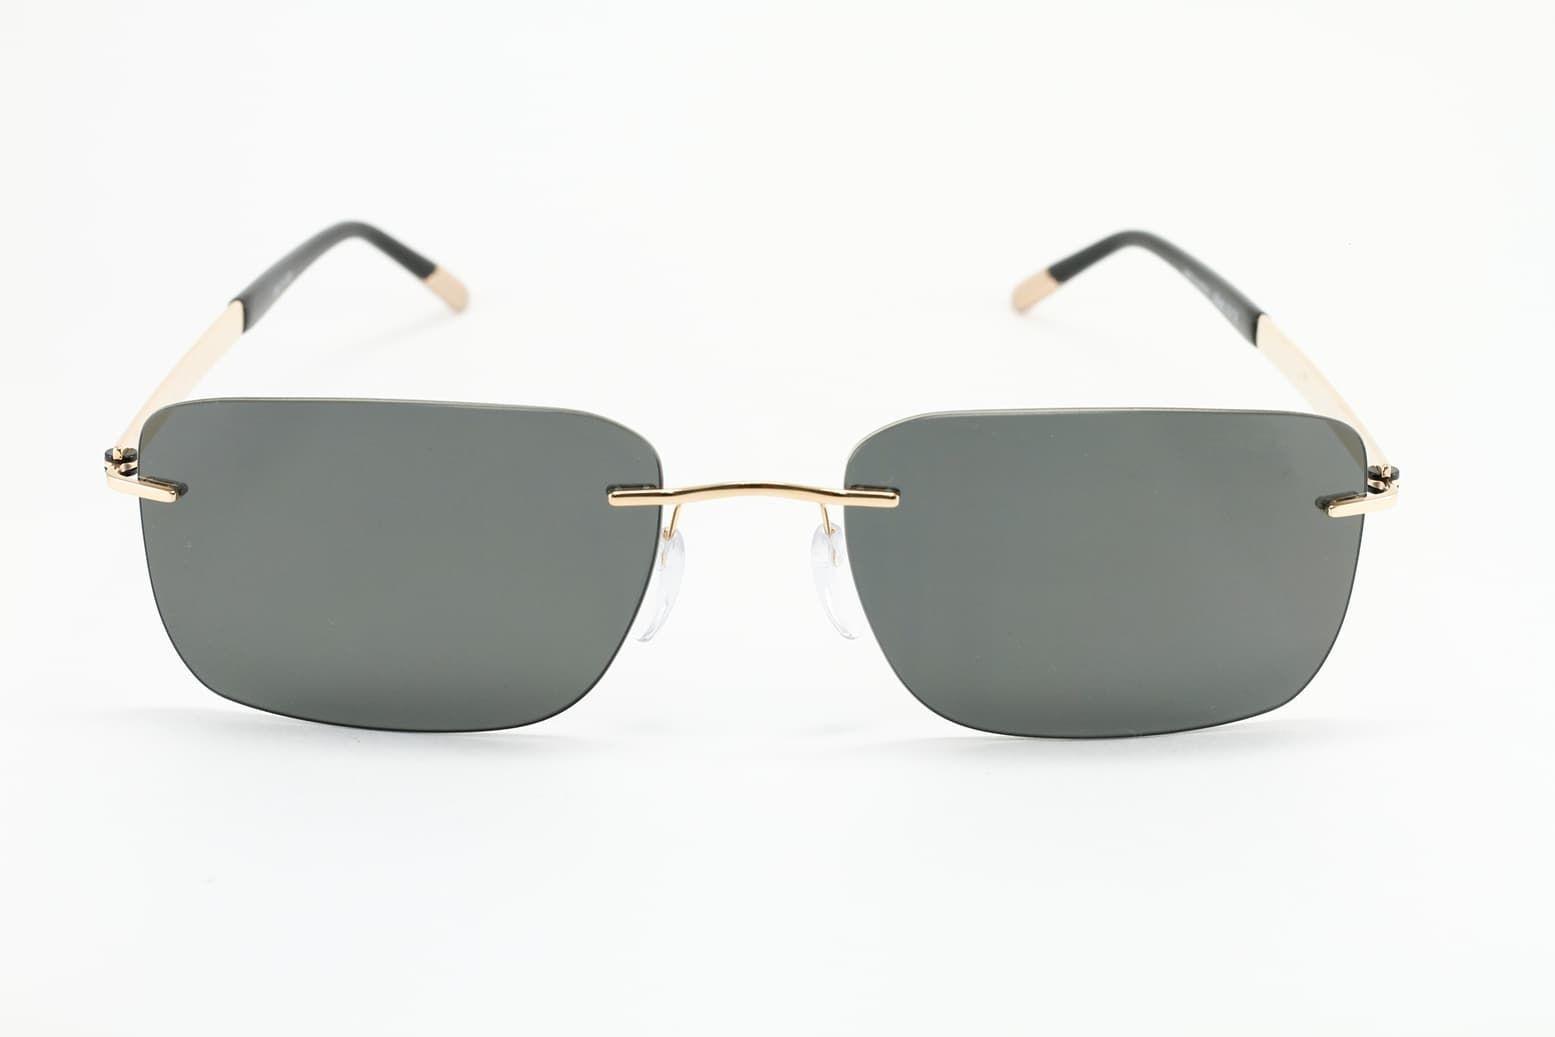 fdc1e07a78ae Купить солнцезащитные очки silhouette 8683 6052 за 24 500 руб. в ...